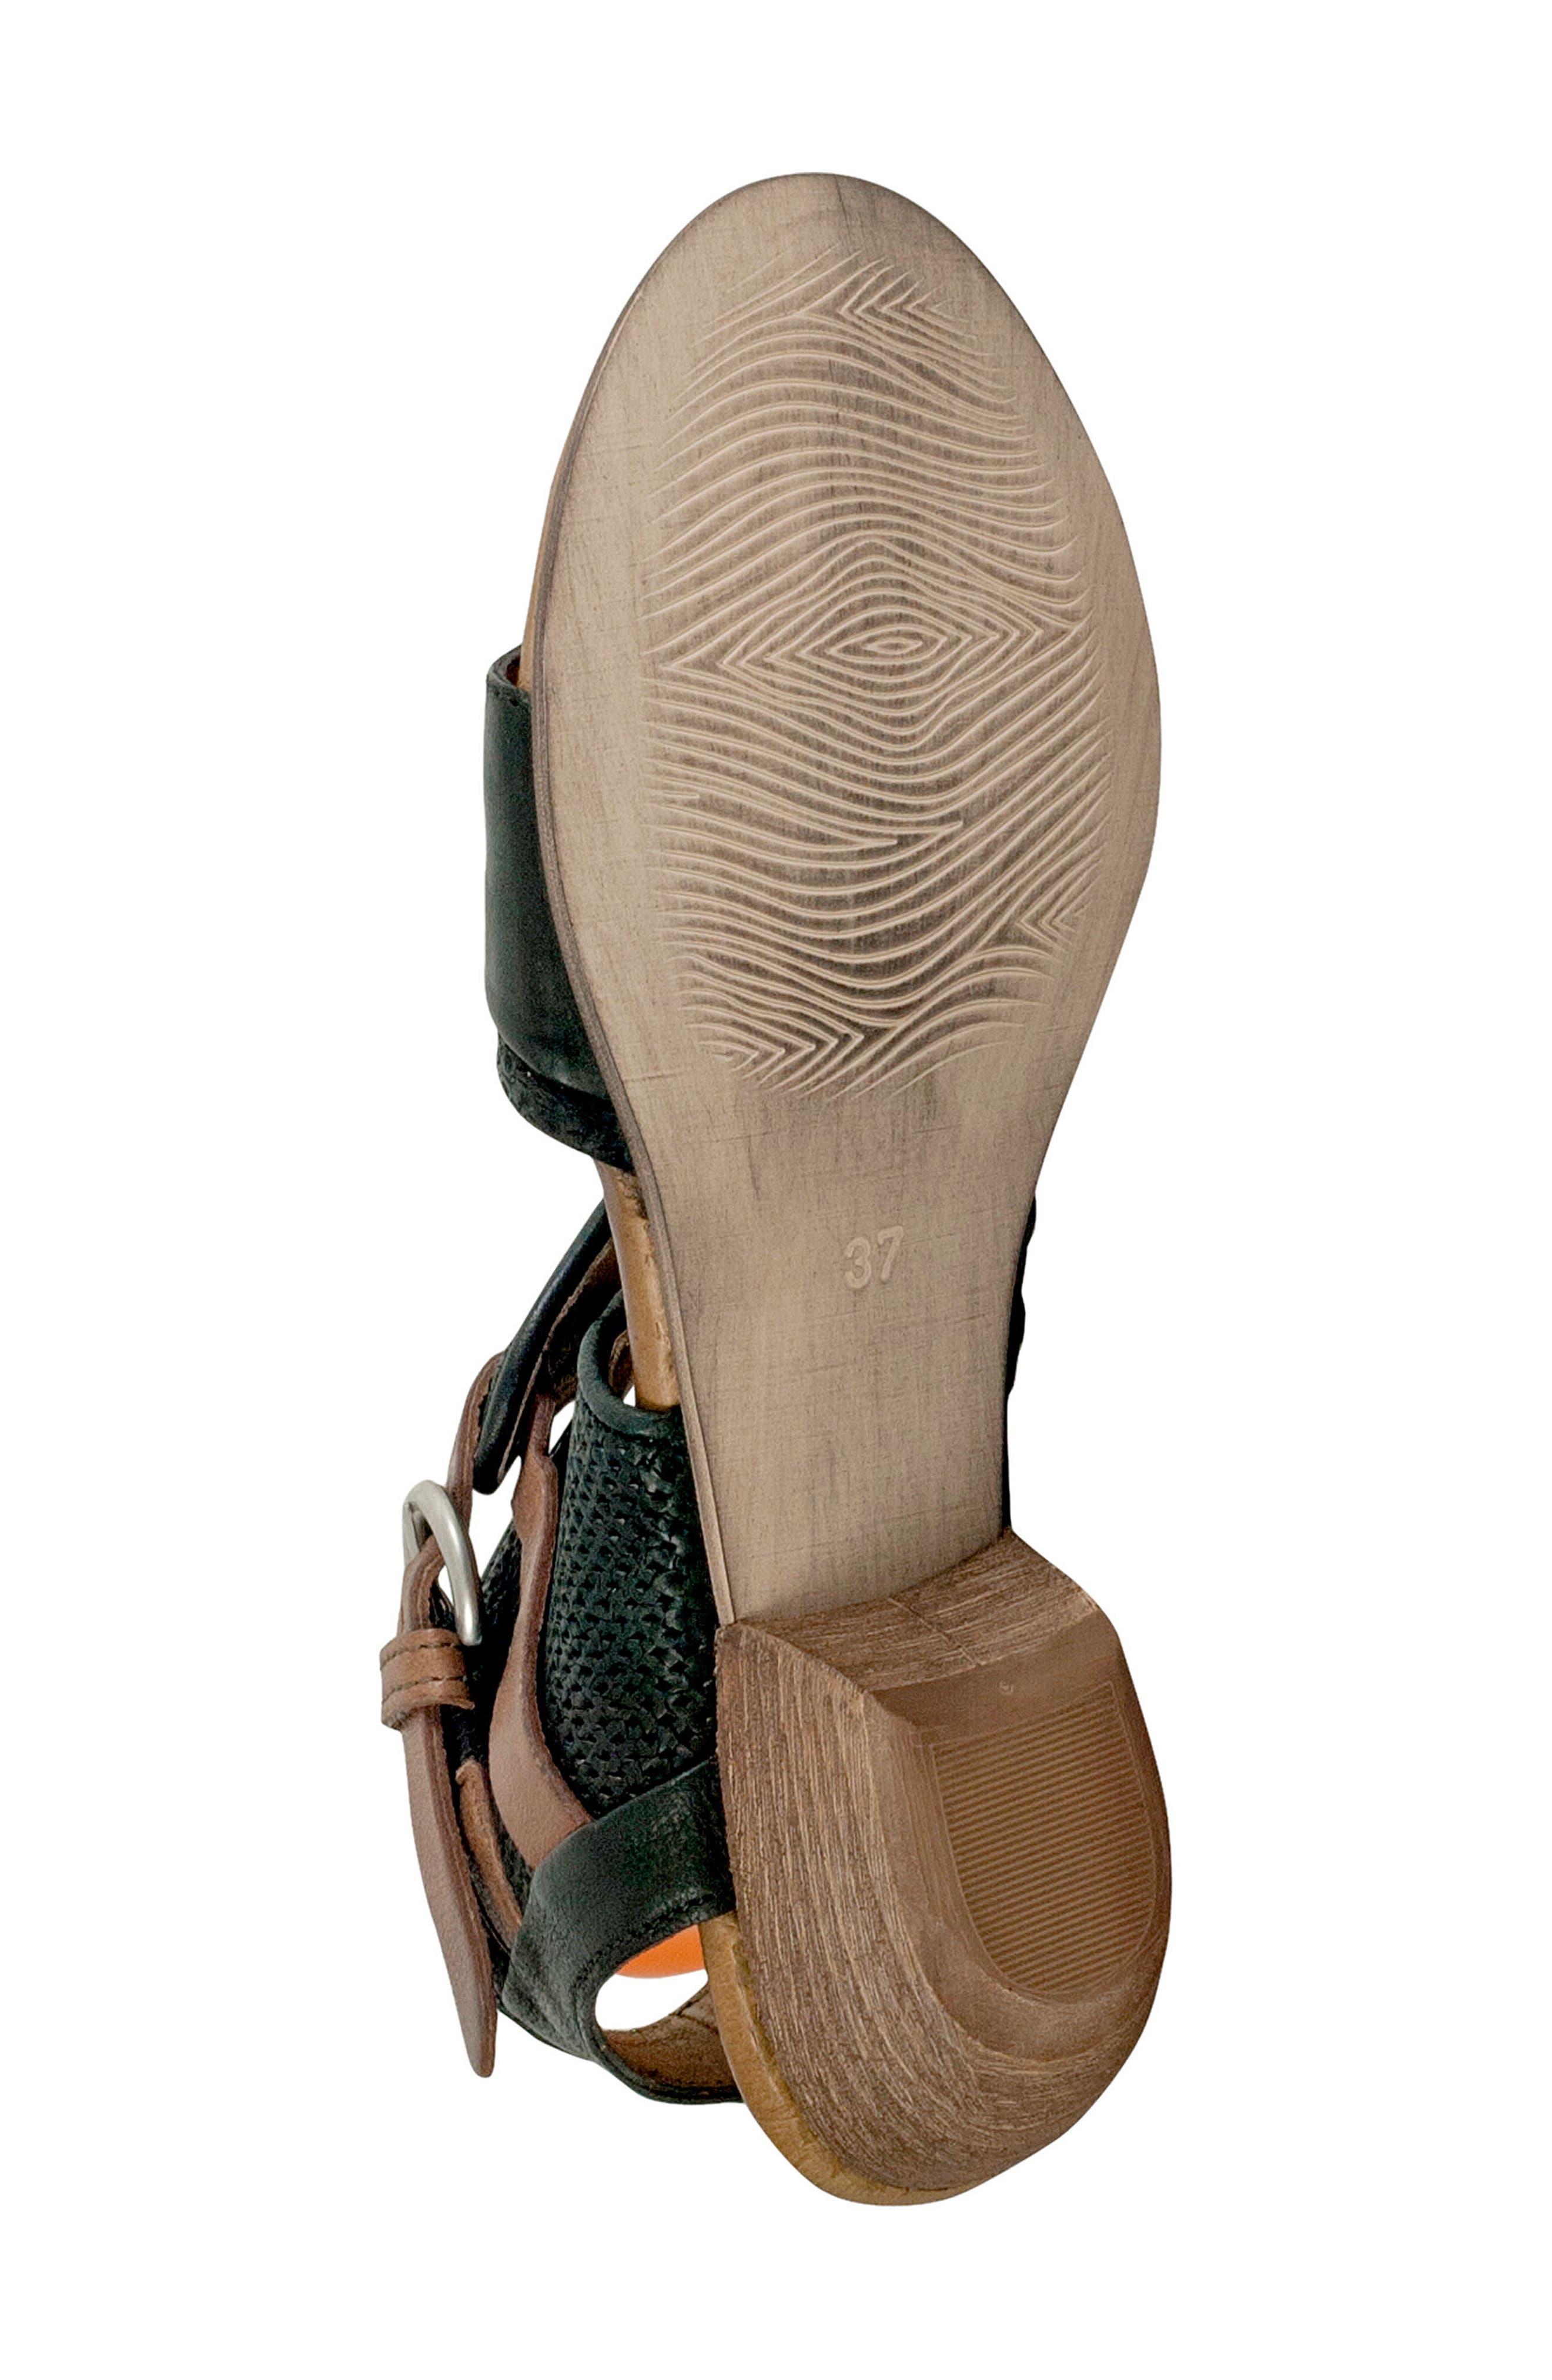 Chatham Textured Sandal,                             Alternate thumbnail 6, color,                             001